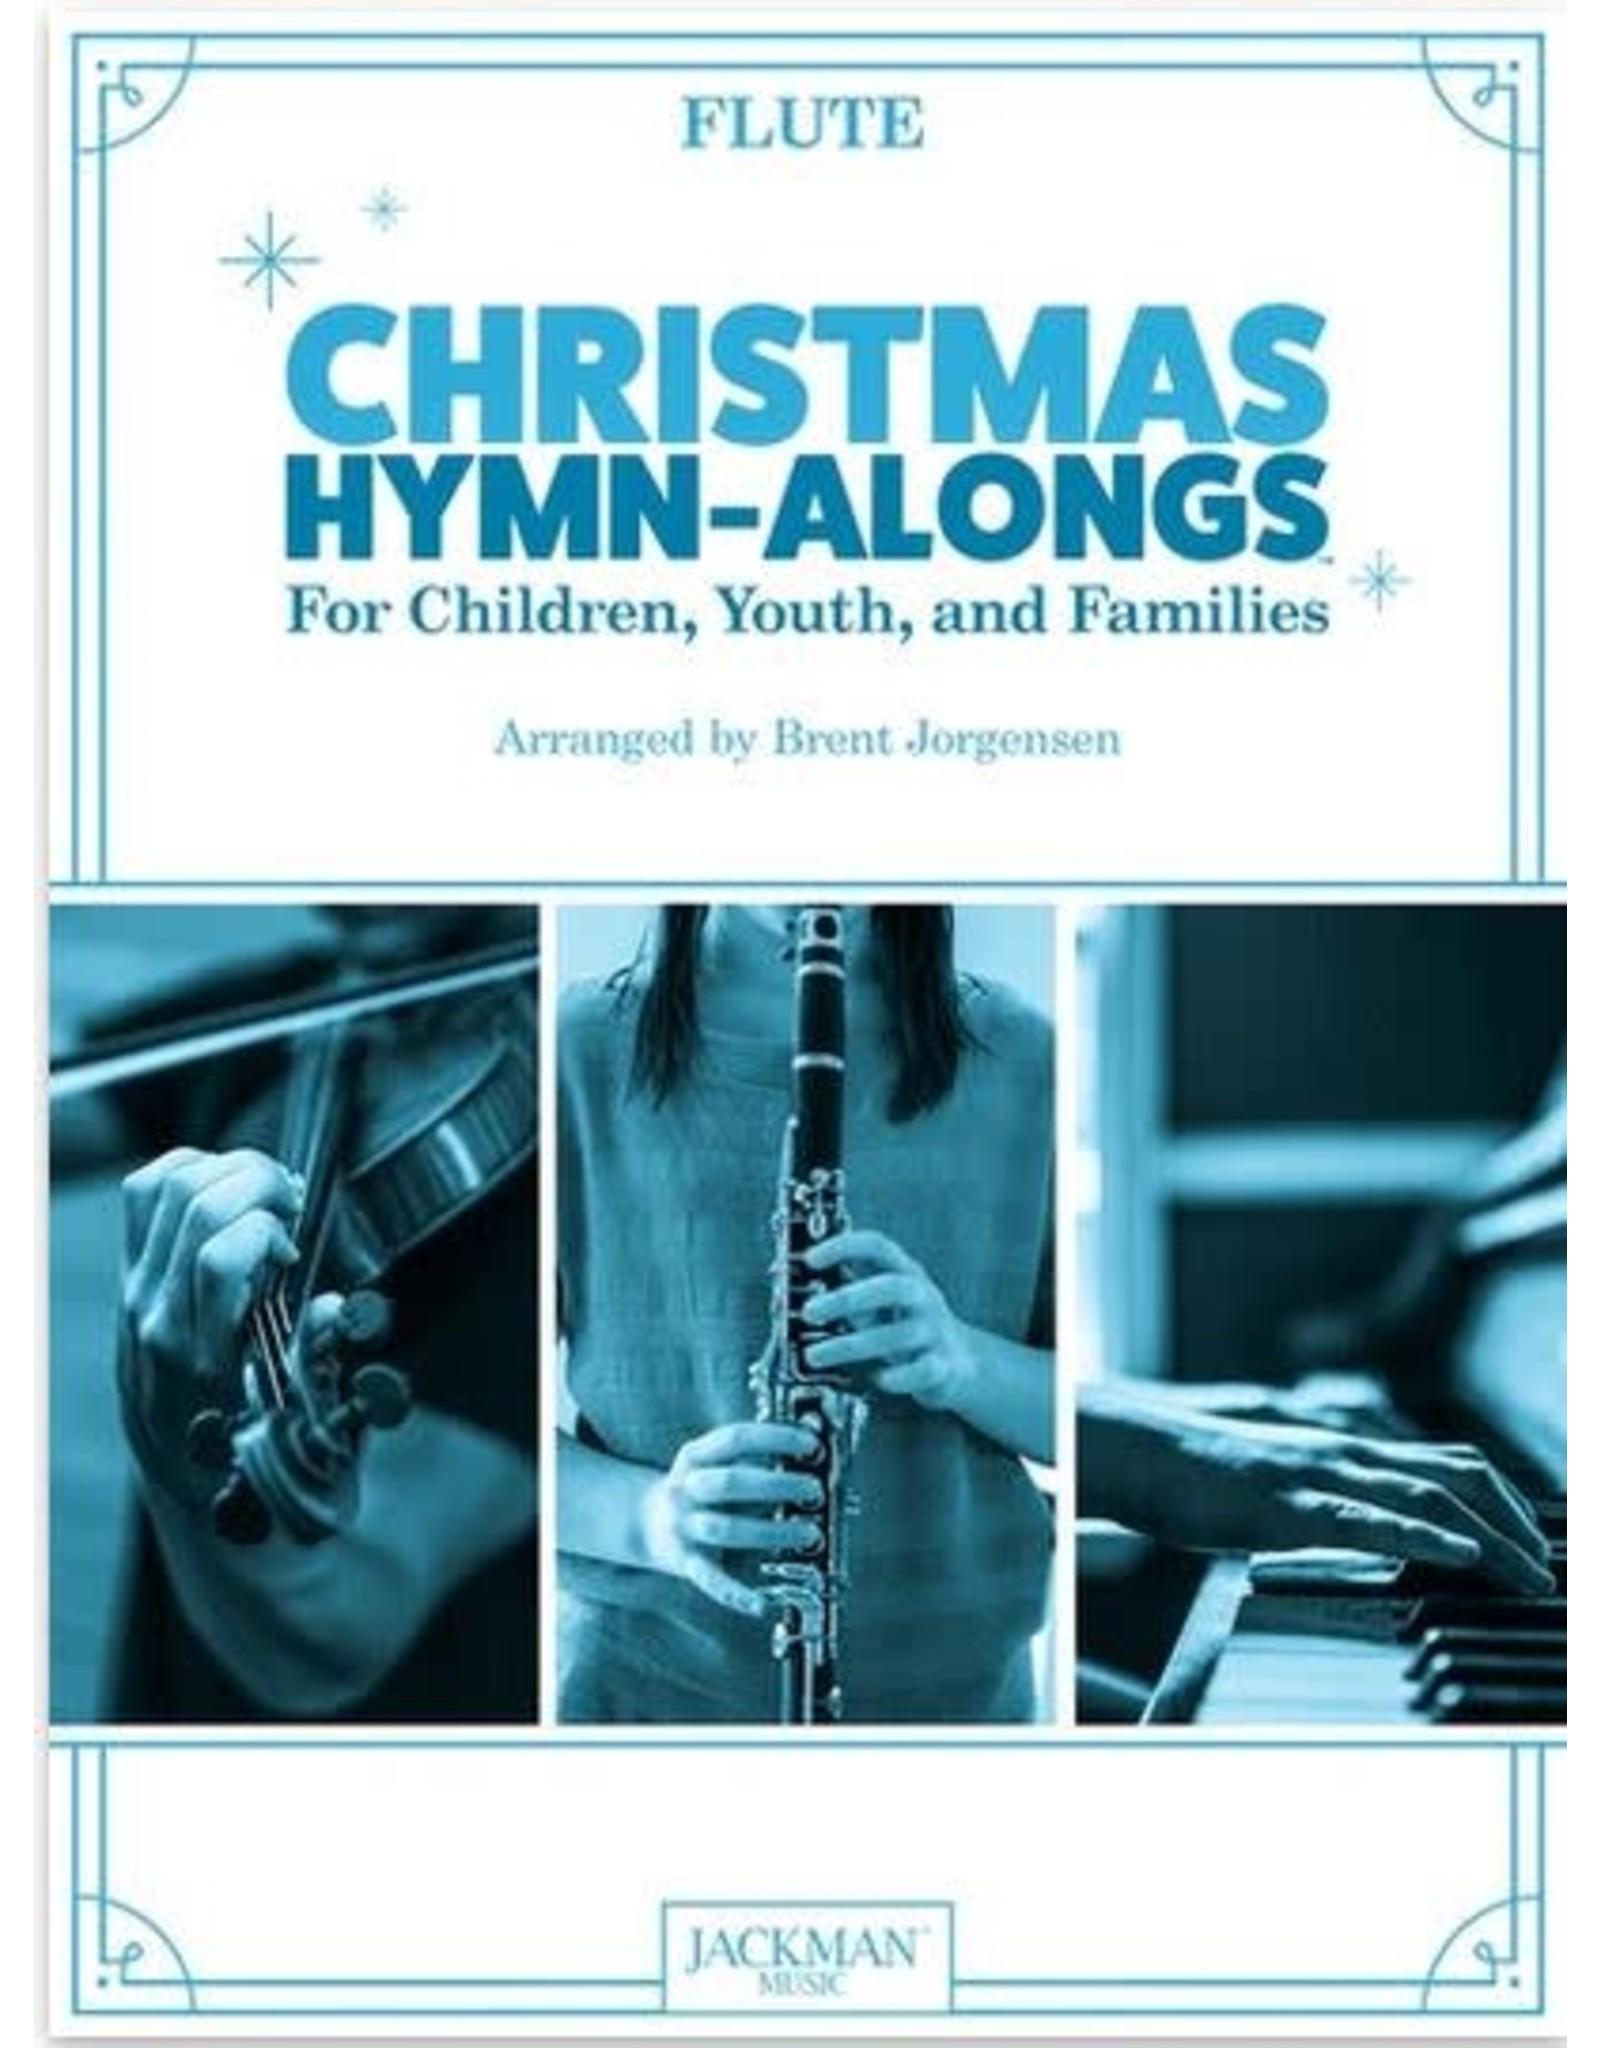 Jackman Music Christmas Hymn-Alongs - arr. Brent Jorgensen - Flute